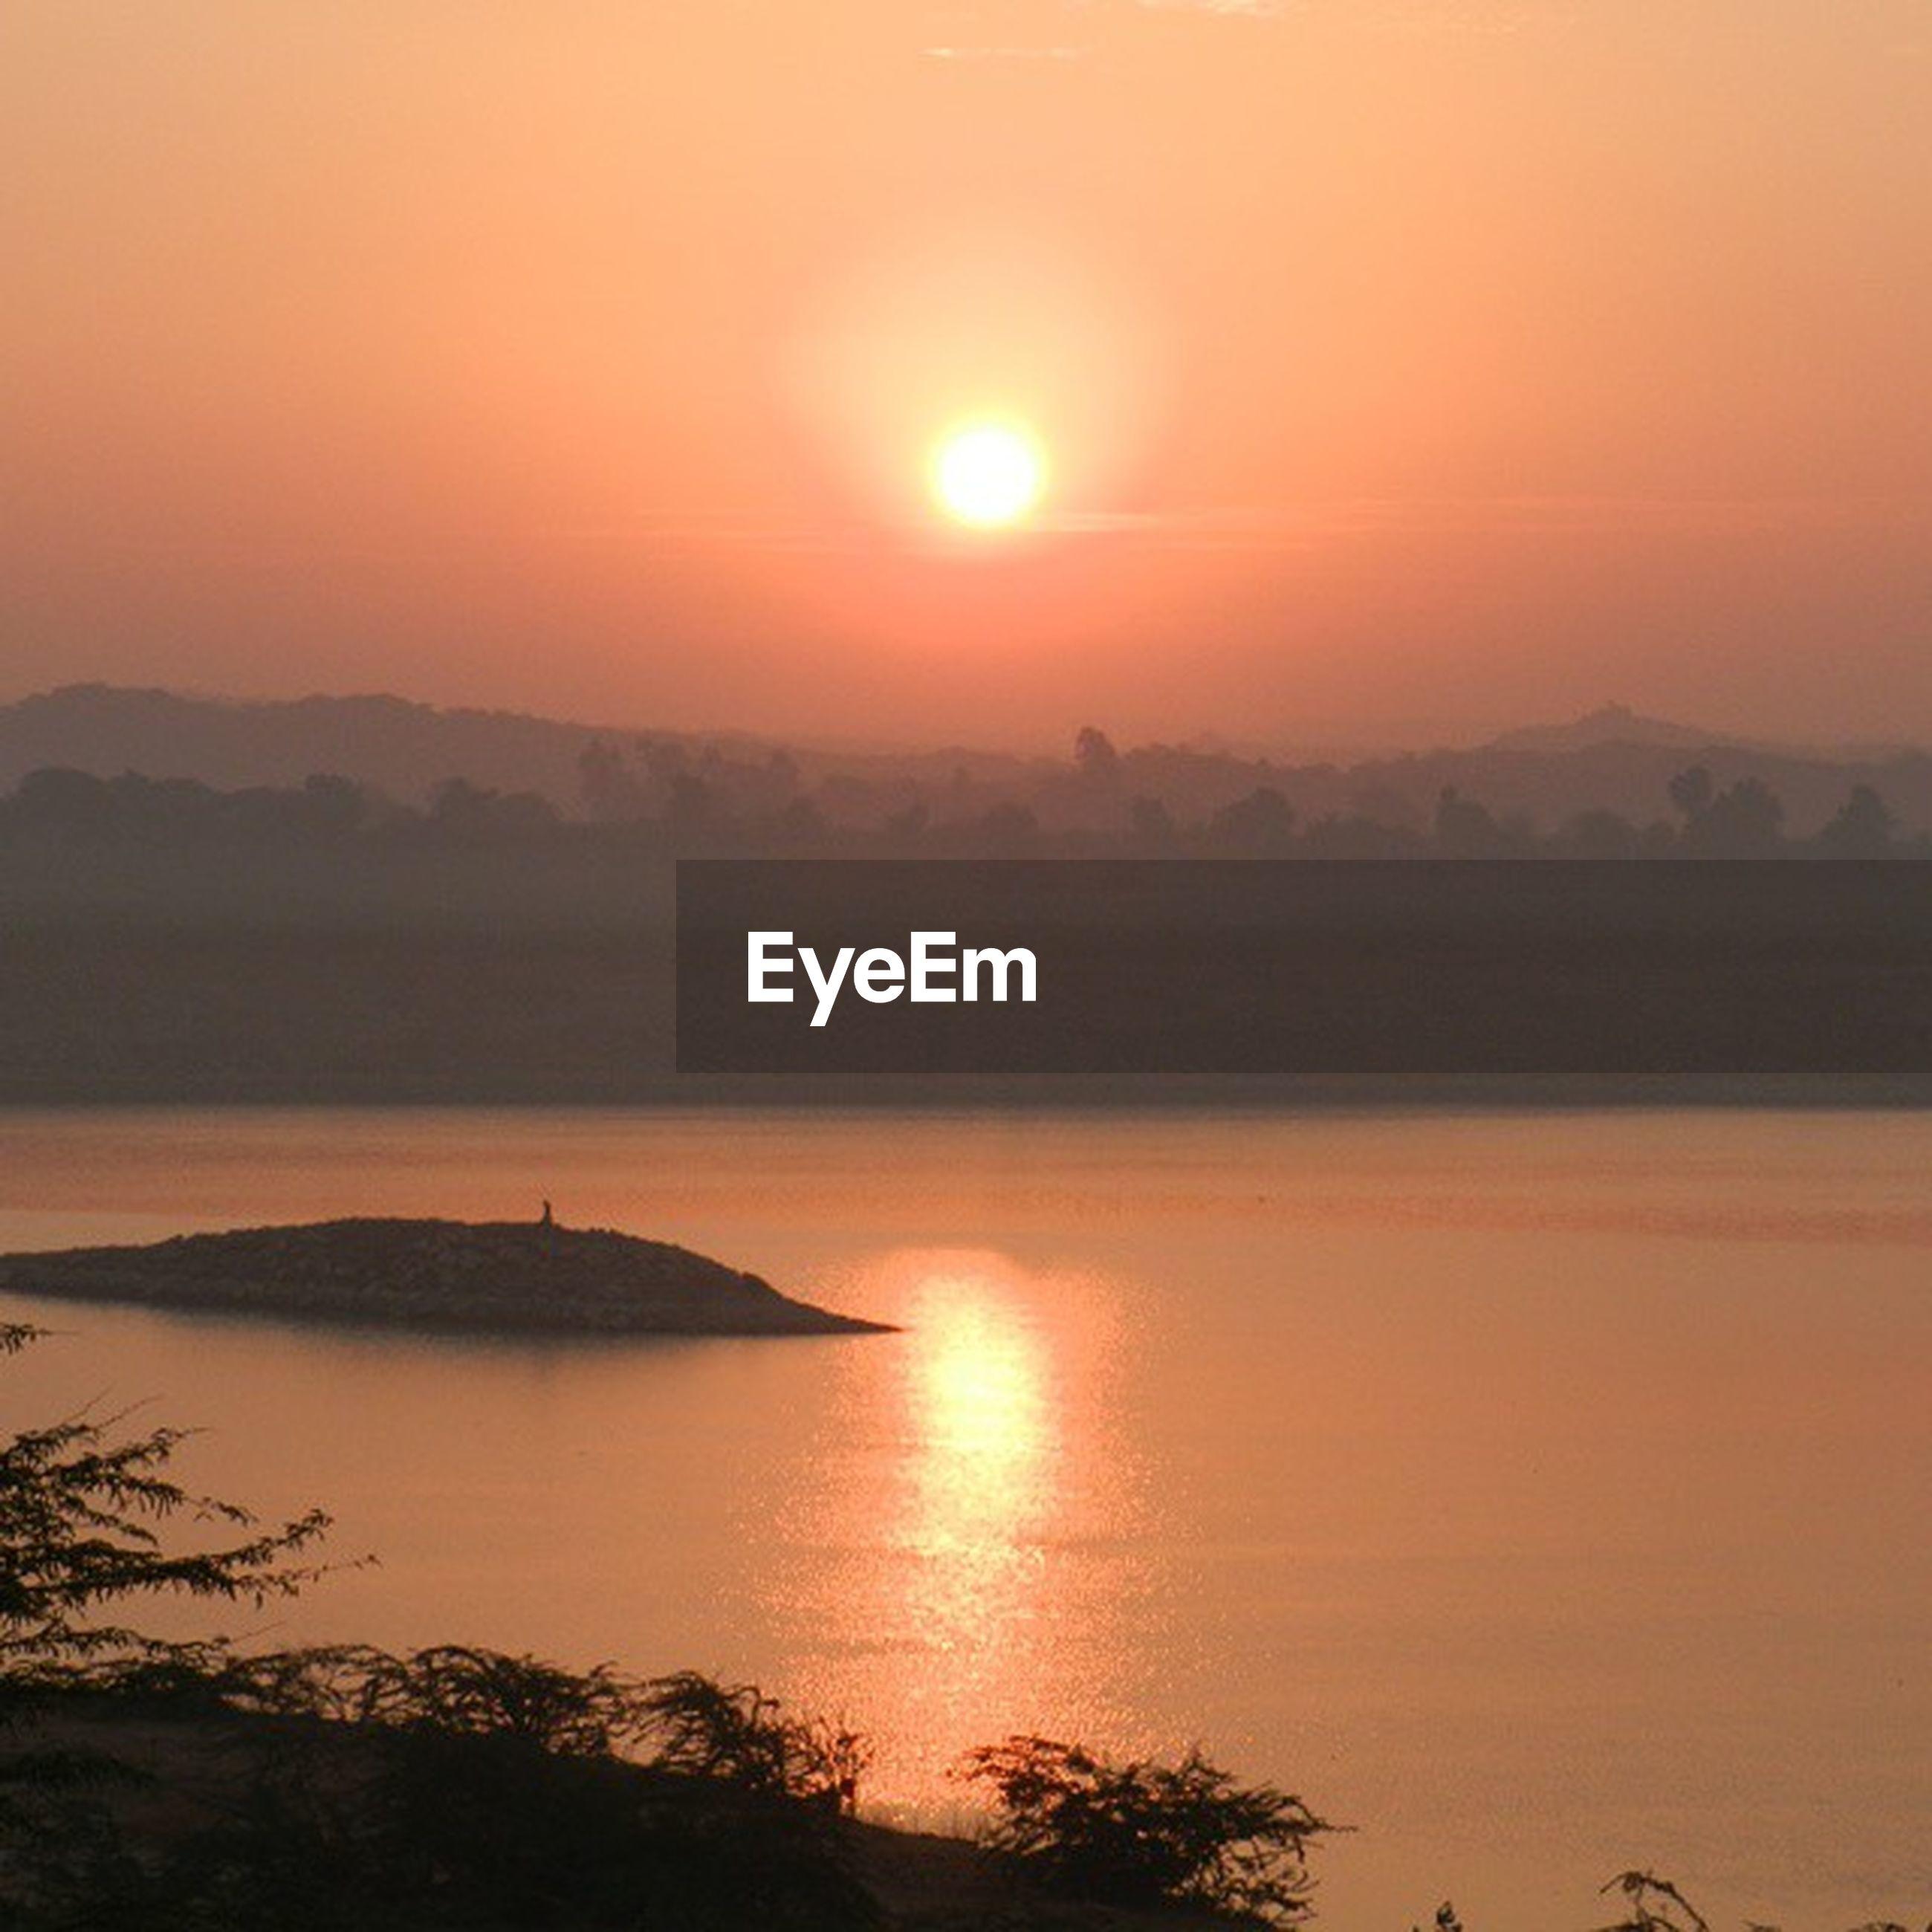 sunset, sun, water, scenics, tranquil scene, orange color, tranquility, beauty in nature, silhouette, idyllic, reflection, mountain, sea, nature, sky, lake, sunlight, majestic, non-urban scene, outdoors